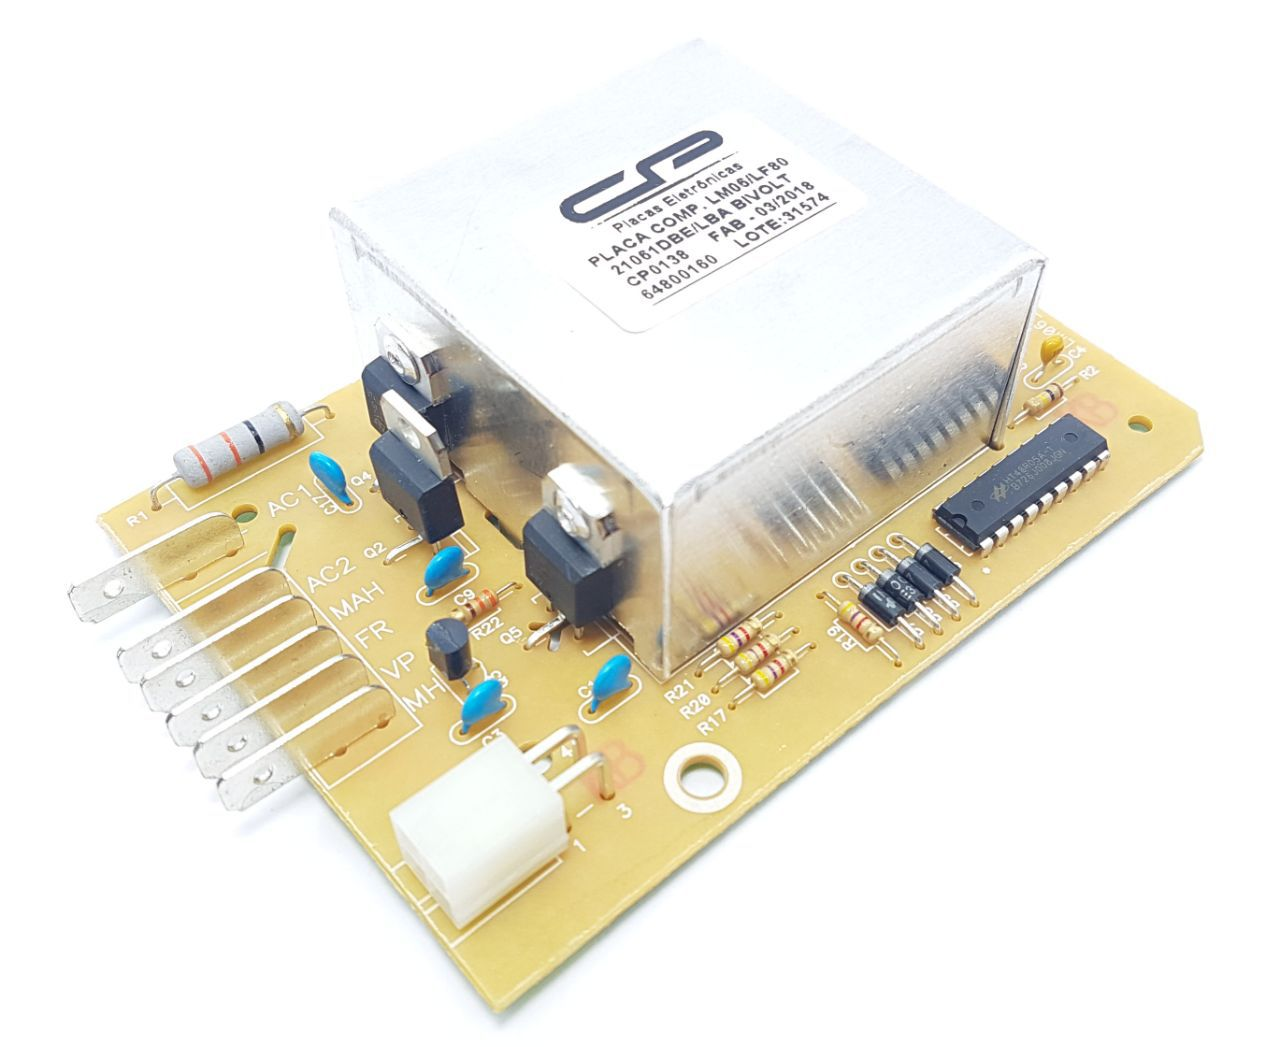 Placa Lavadora Electrolux Compatível Lm06 Lf80 64800160 Bivolt Cp0138